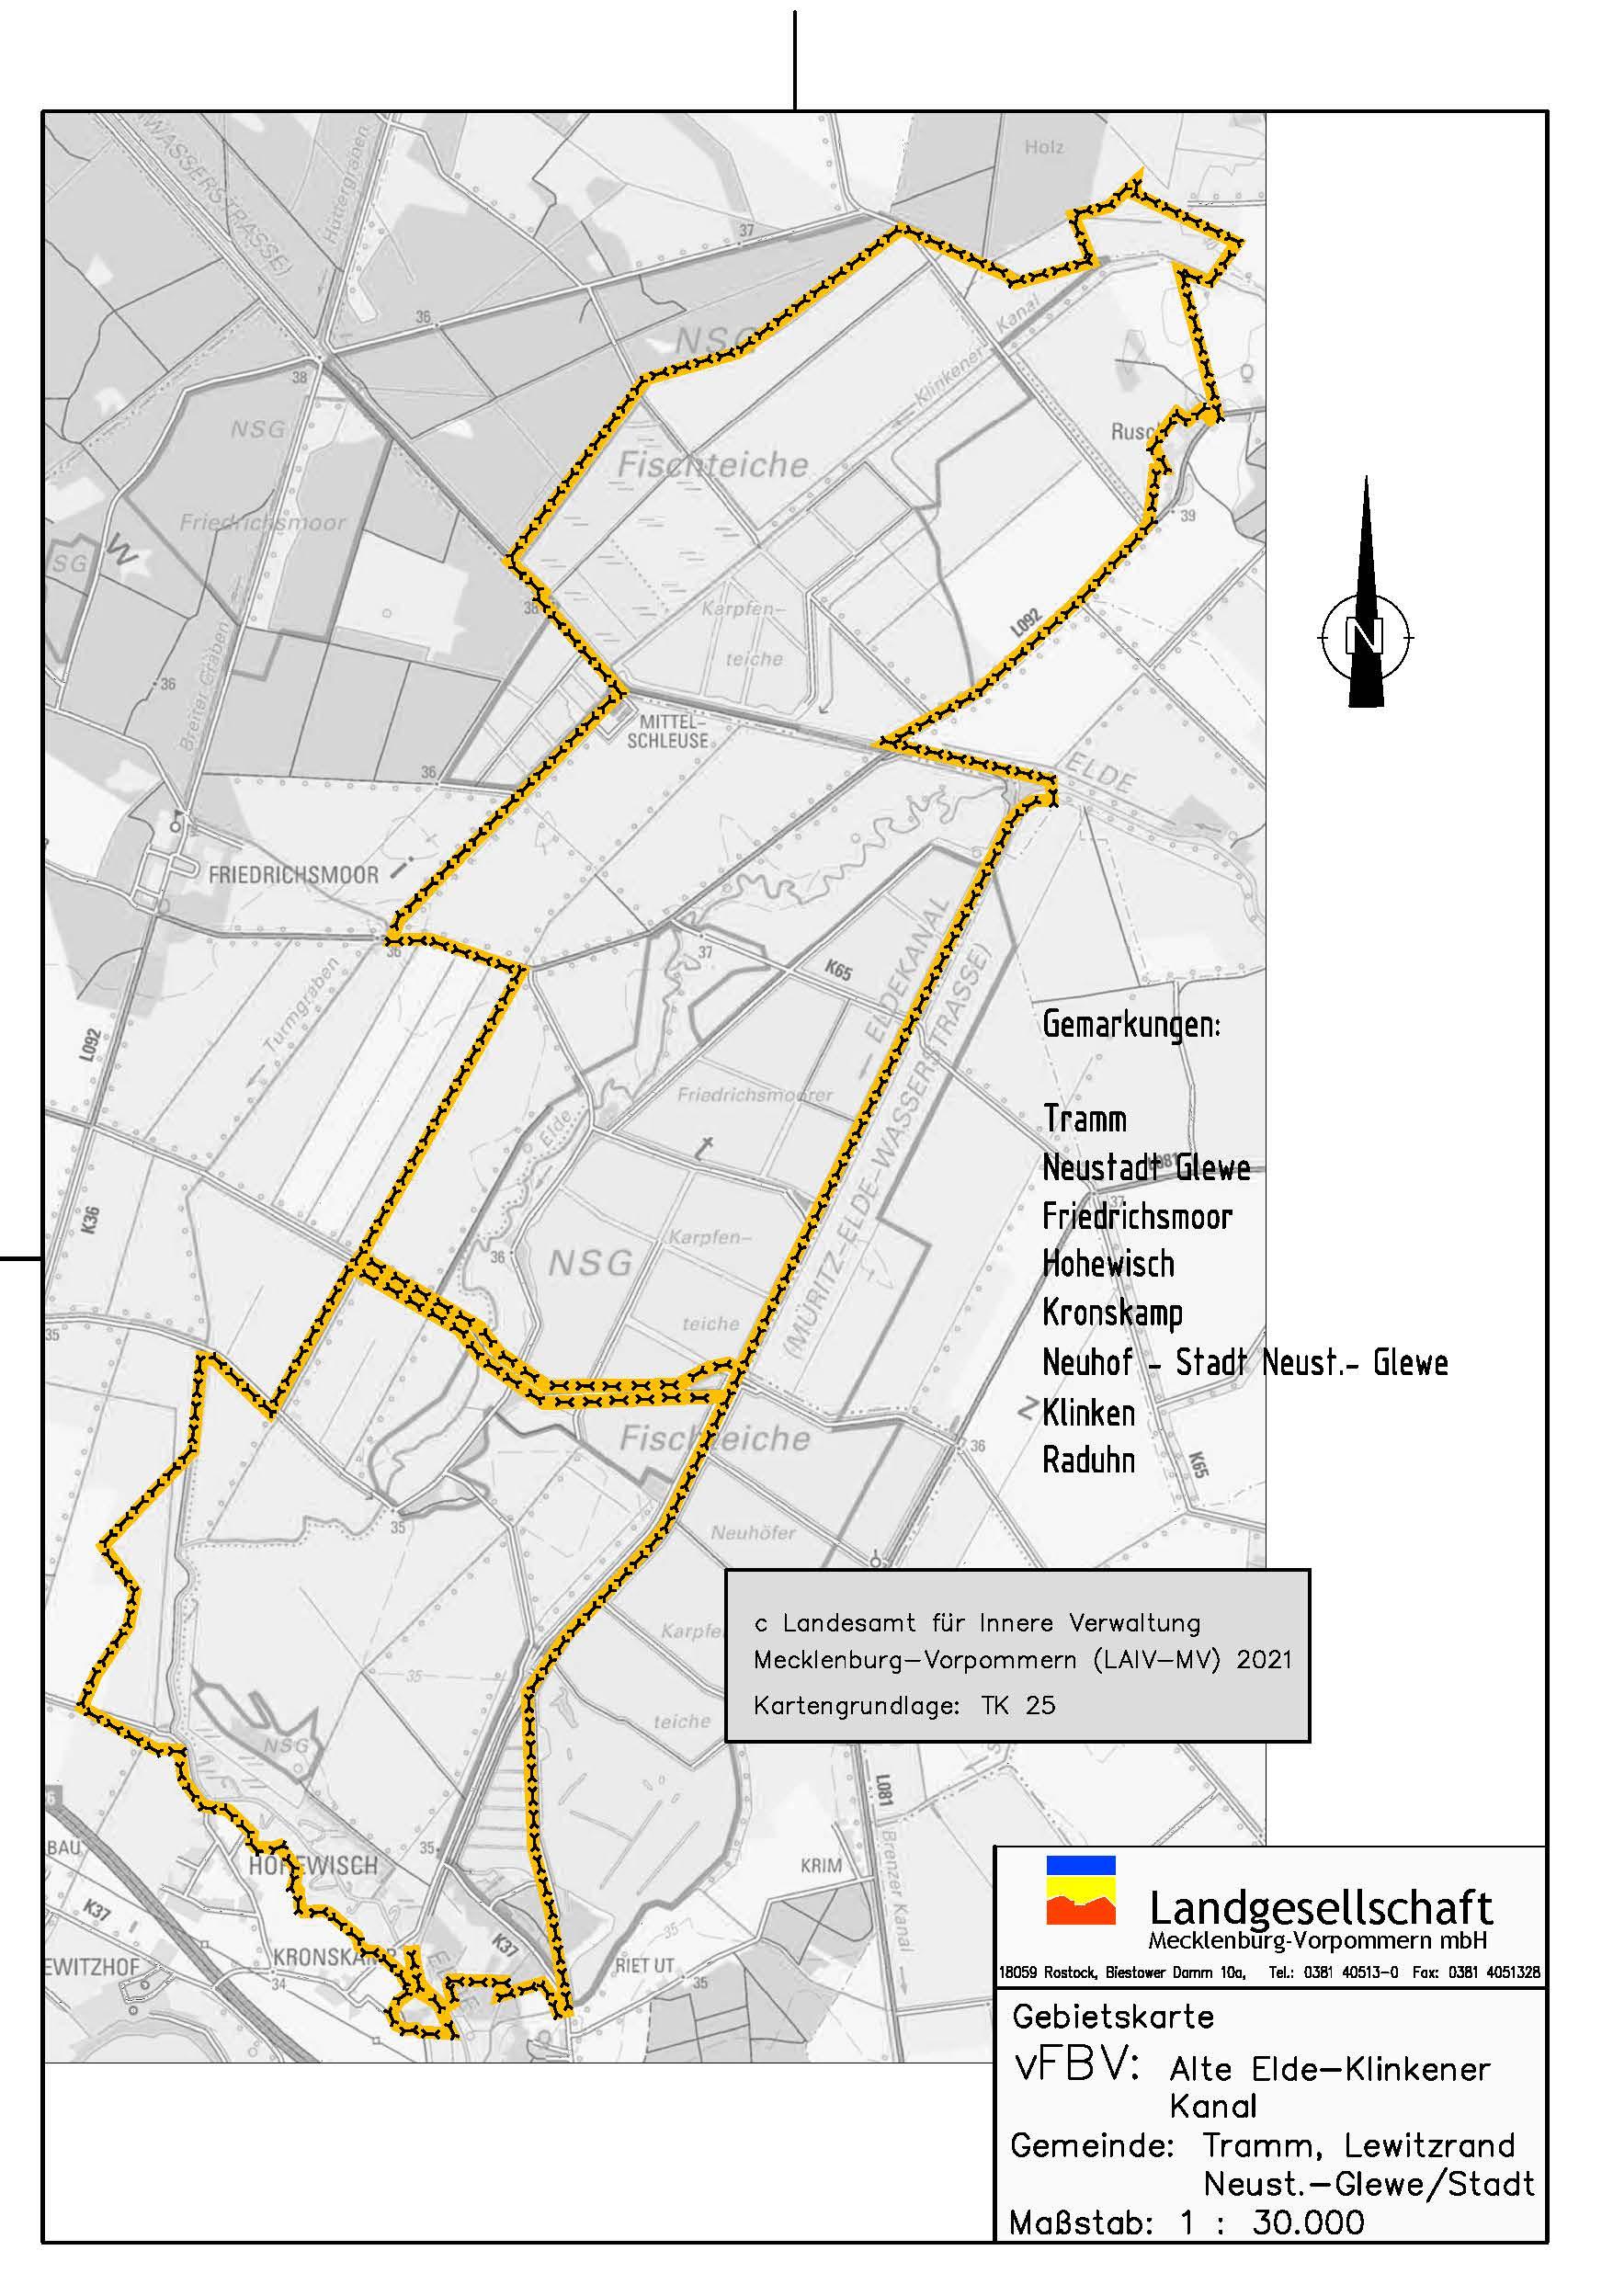 Gebietskarte vFBV Alte Elde_Klinkener Kanal